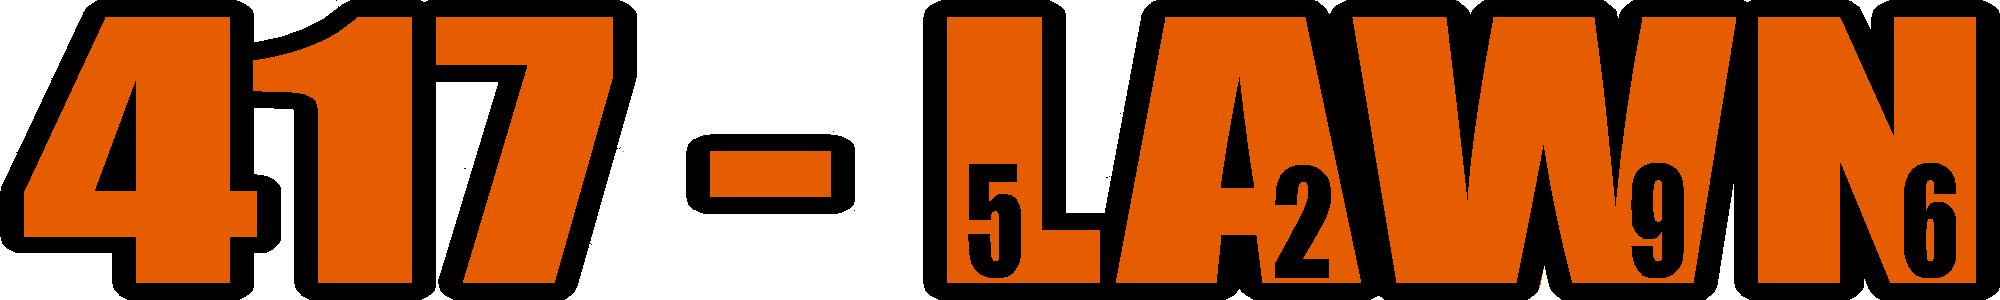 417-LAWN